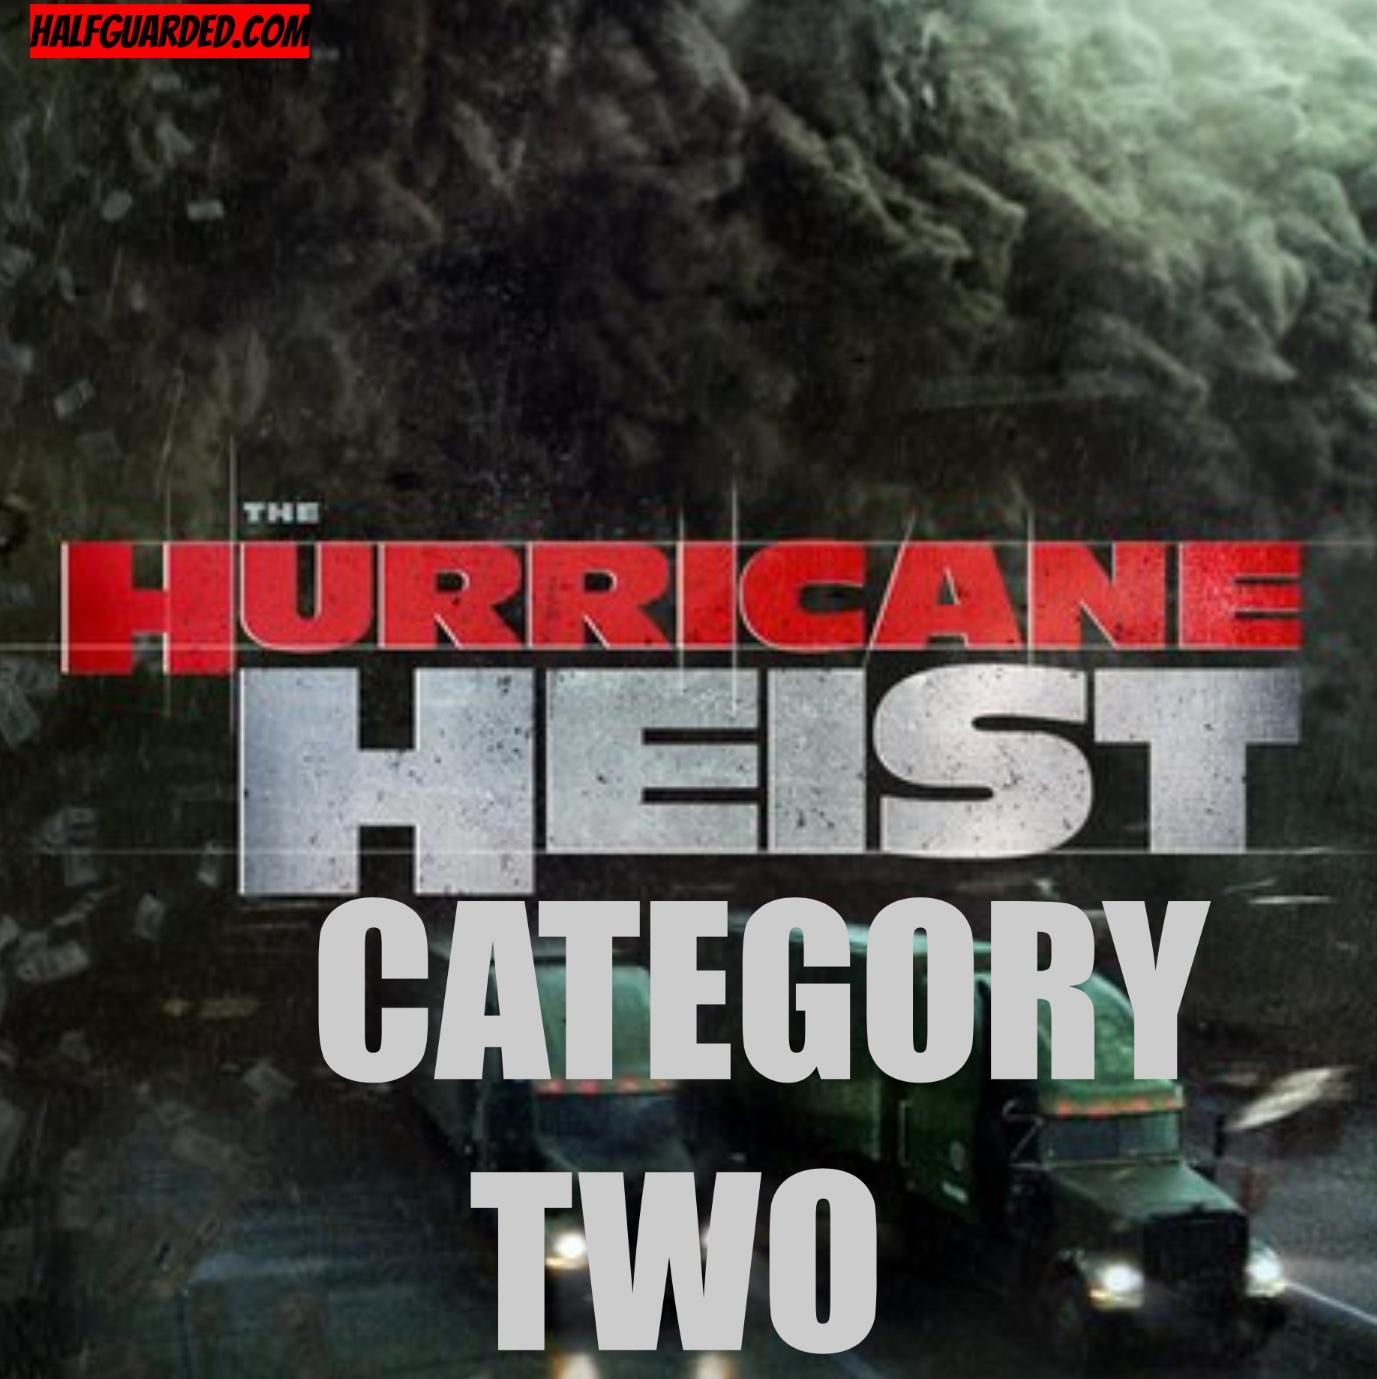 Hurricane Heist 2 (2020) Cast, Plot, Rumors, and Release Date News